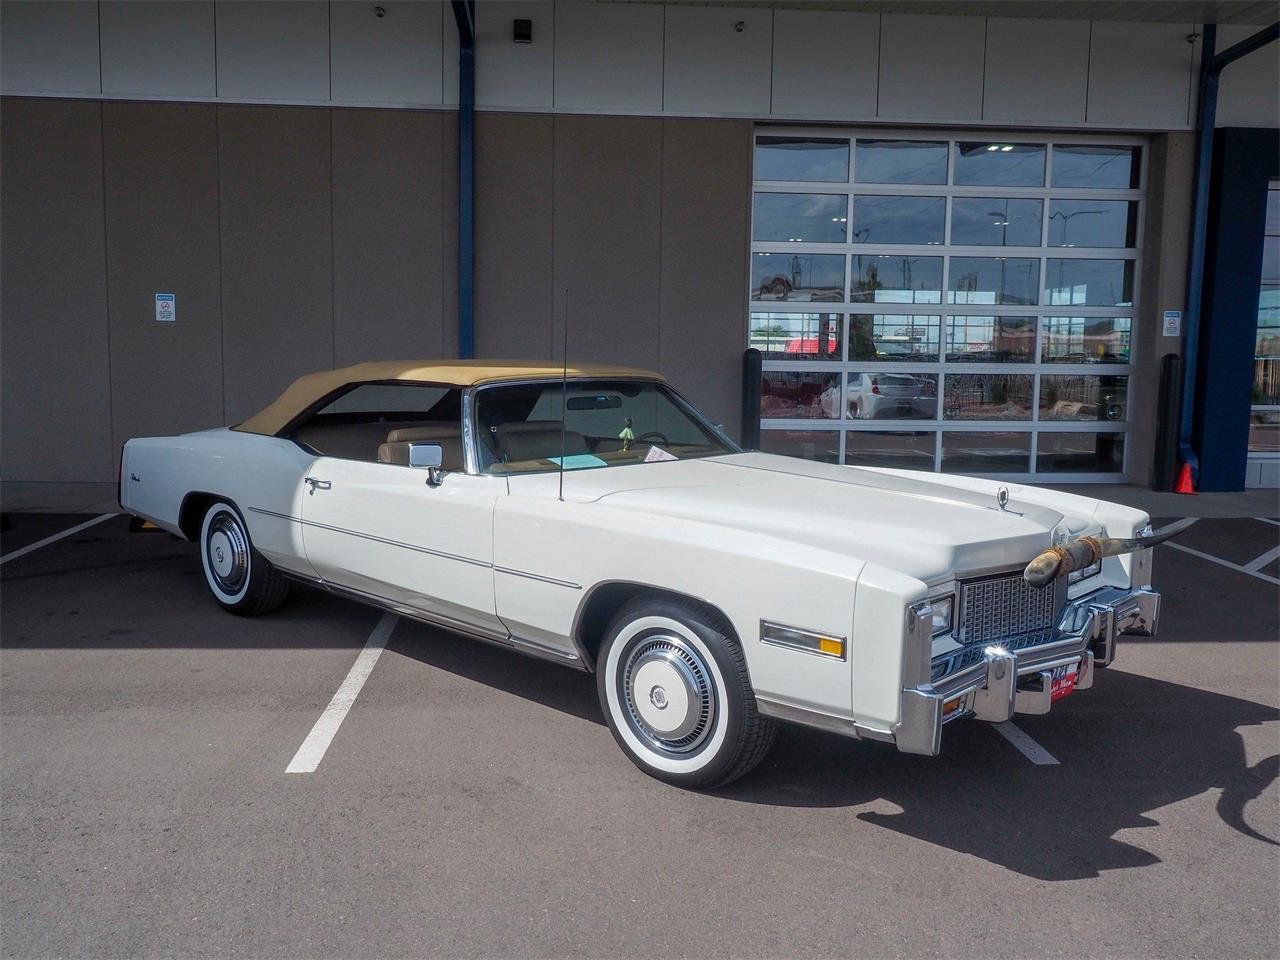 Large Picture of 1976 Cadillac Eldorado located in Englewood Colorado - $26,990.00 - Q2GO